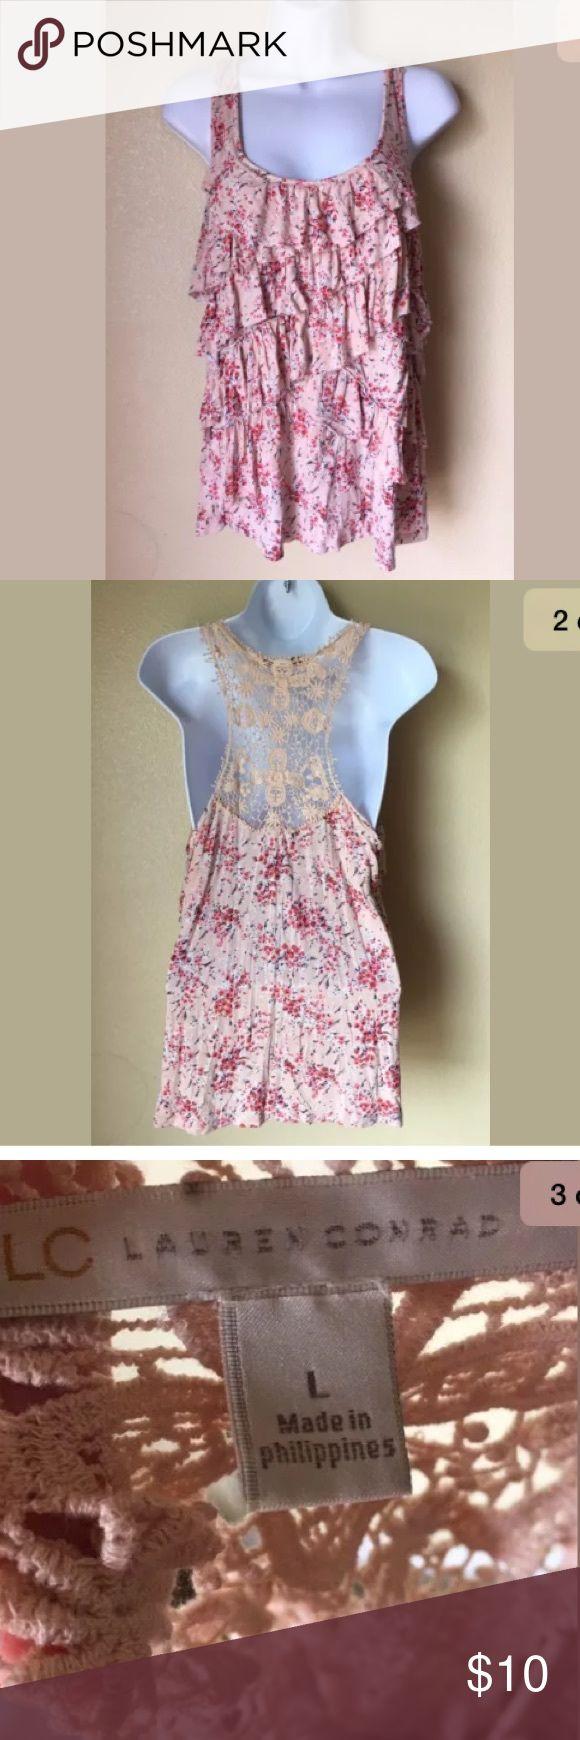 Lauren Conrad Floral Sleeveless Crochet Shirt Sz L Lauren Conrad Women's Floral Sleeveless Racerback Layers Crochet Shirt Sz L LC Lauren Conrad Tops Blouses